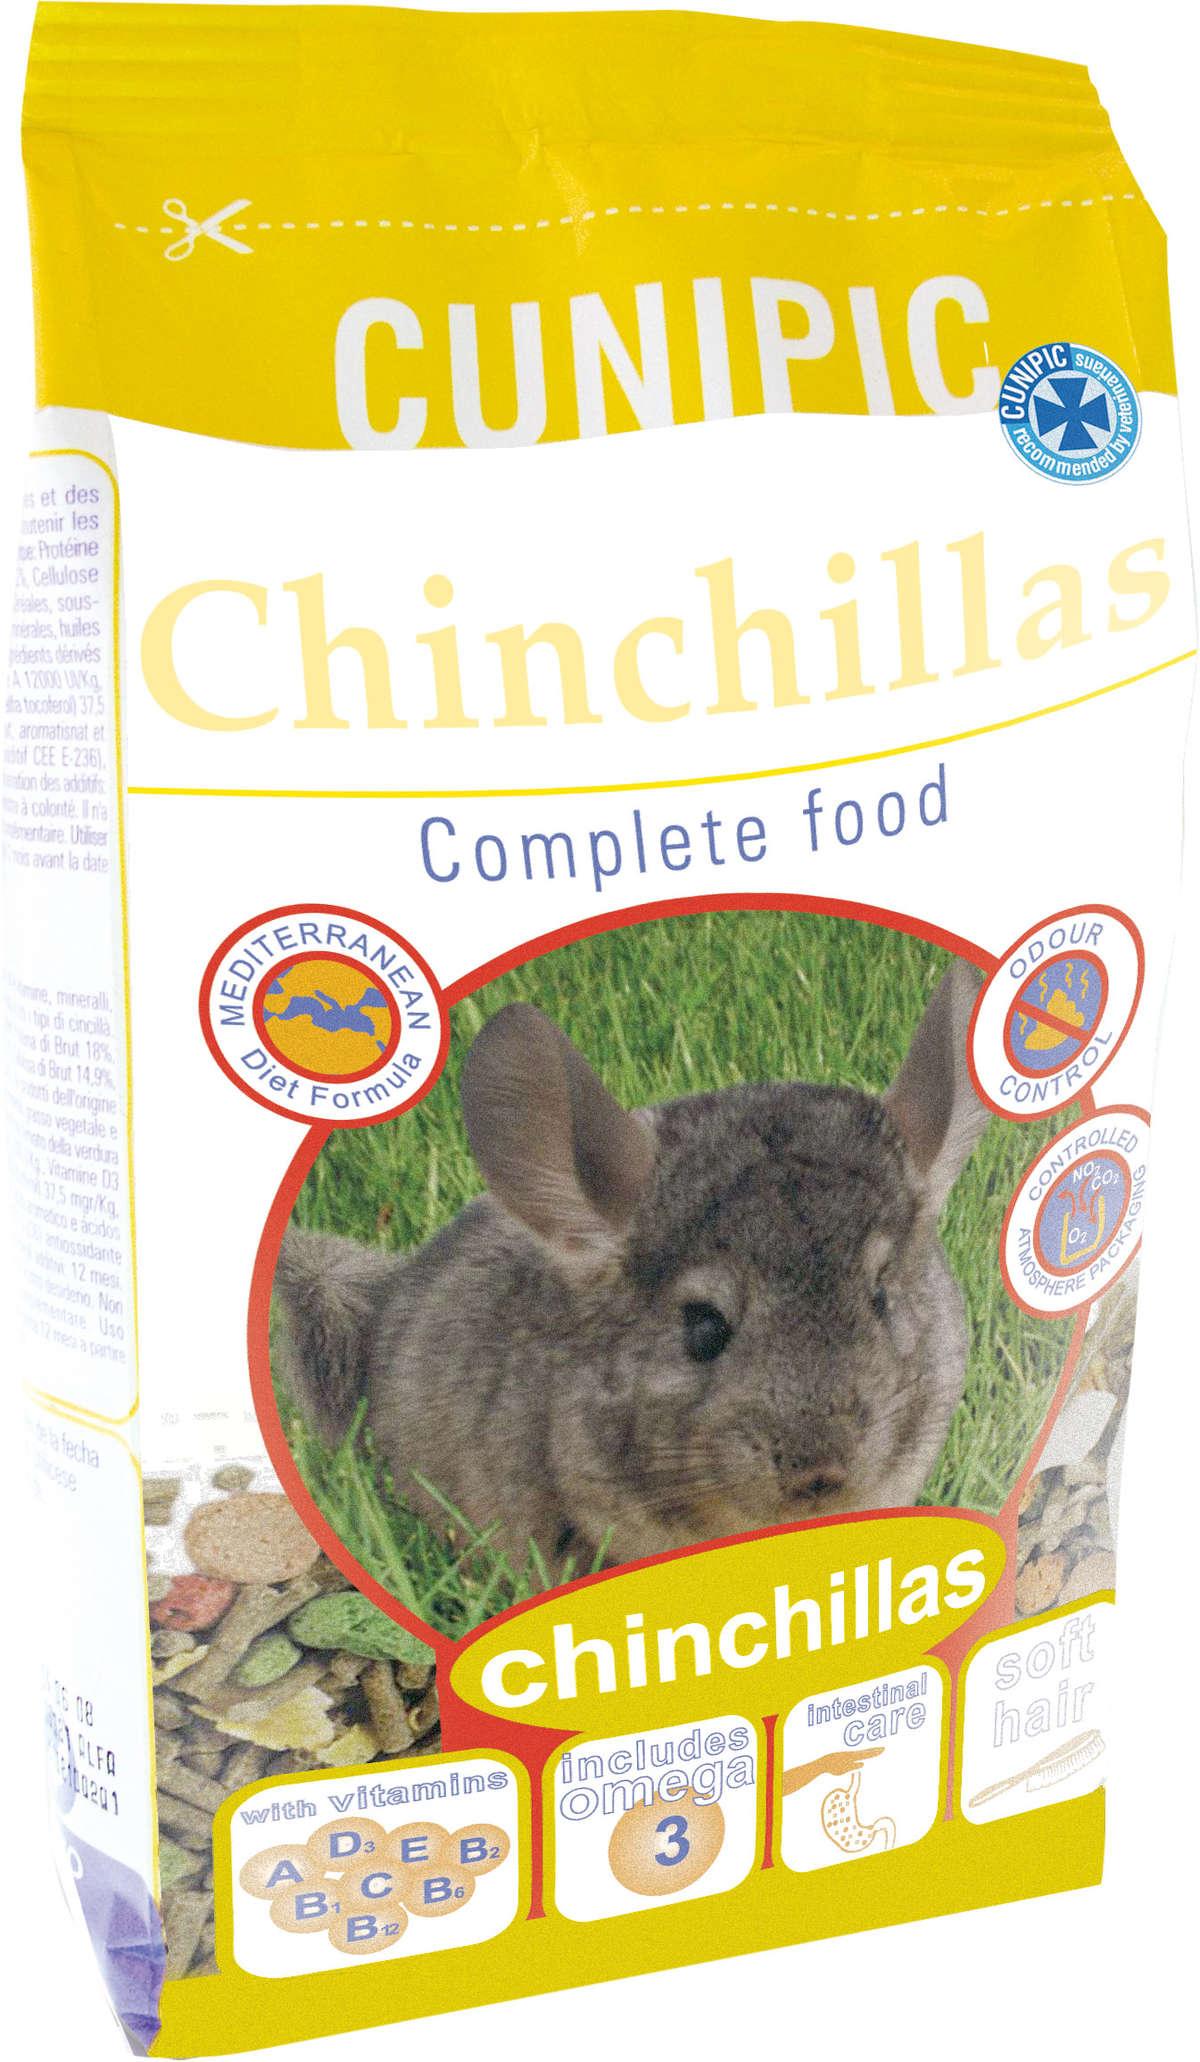 Cunipic Chinchilla